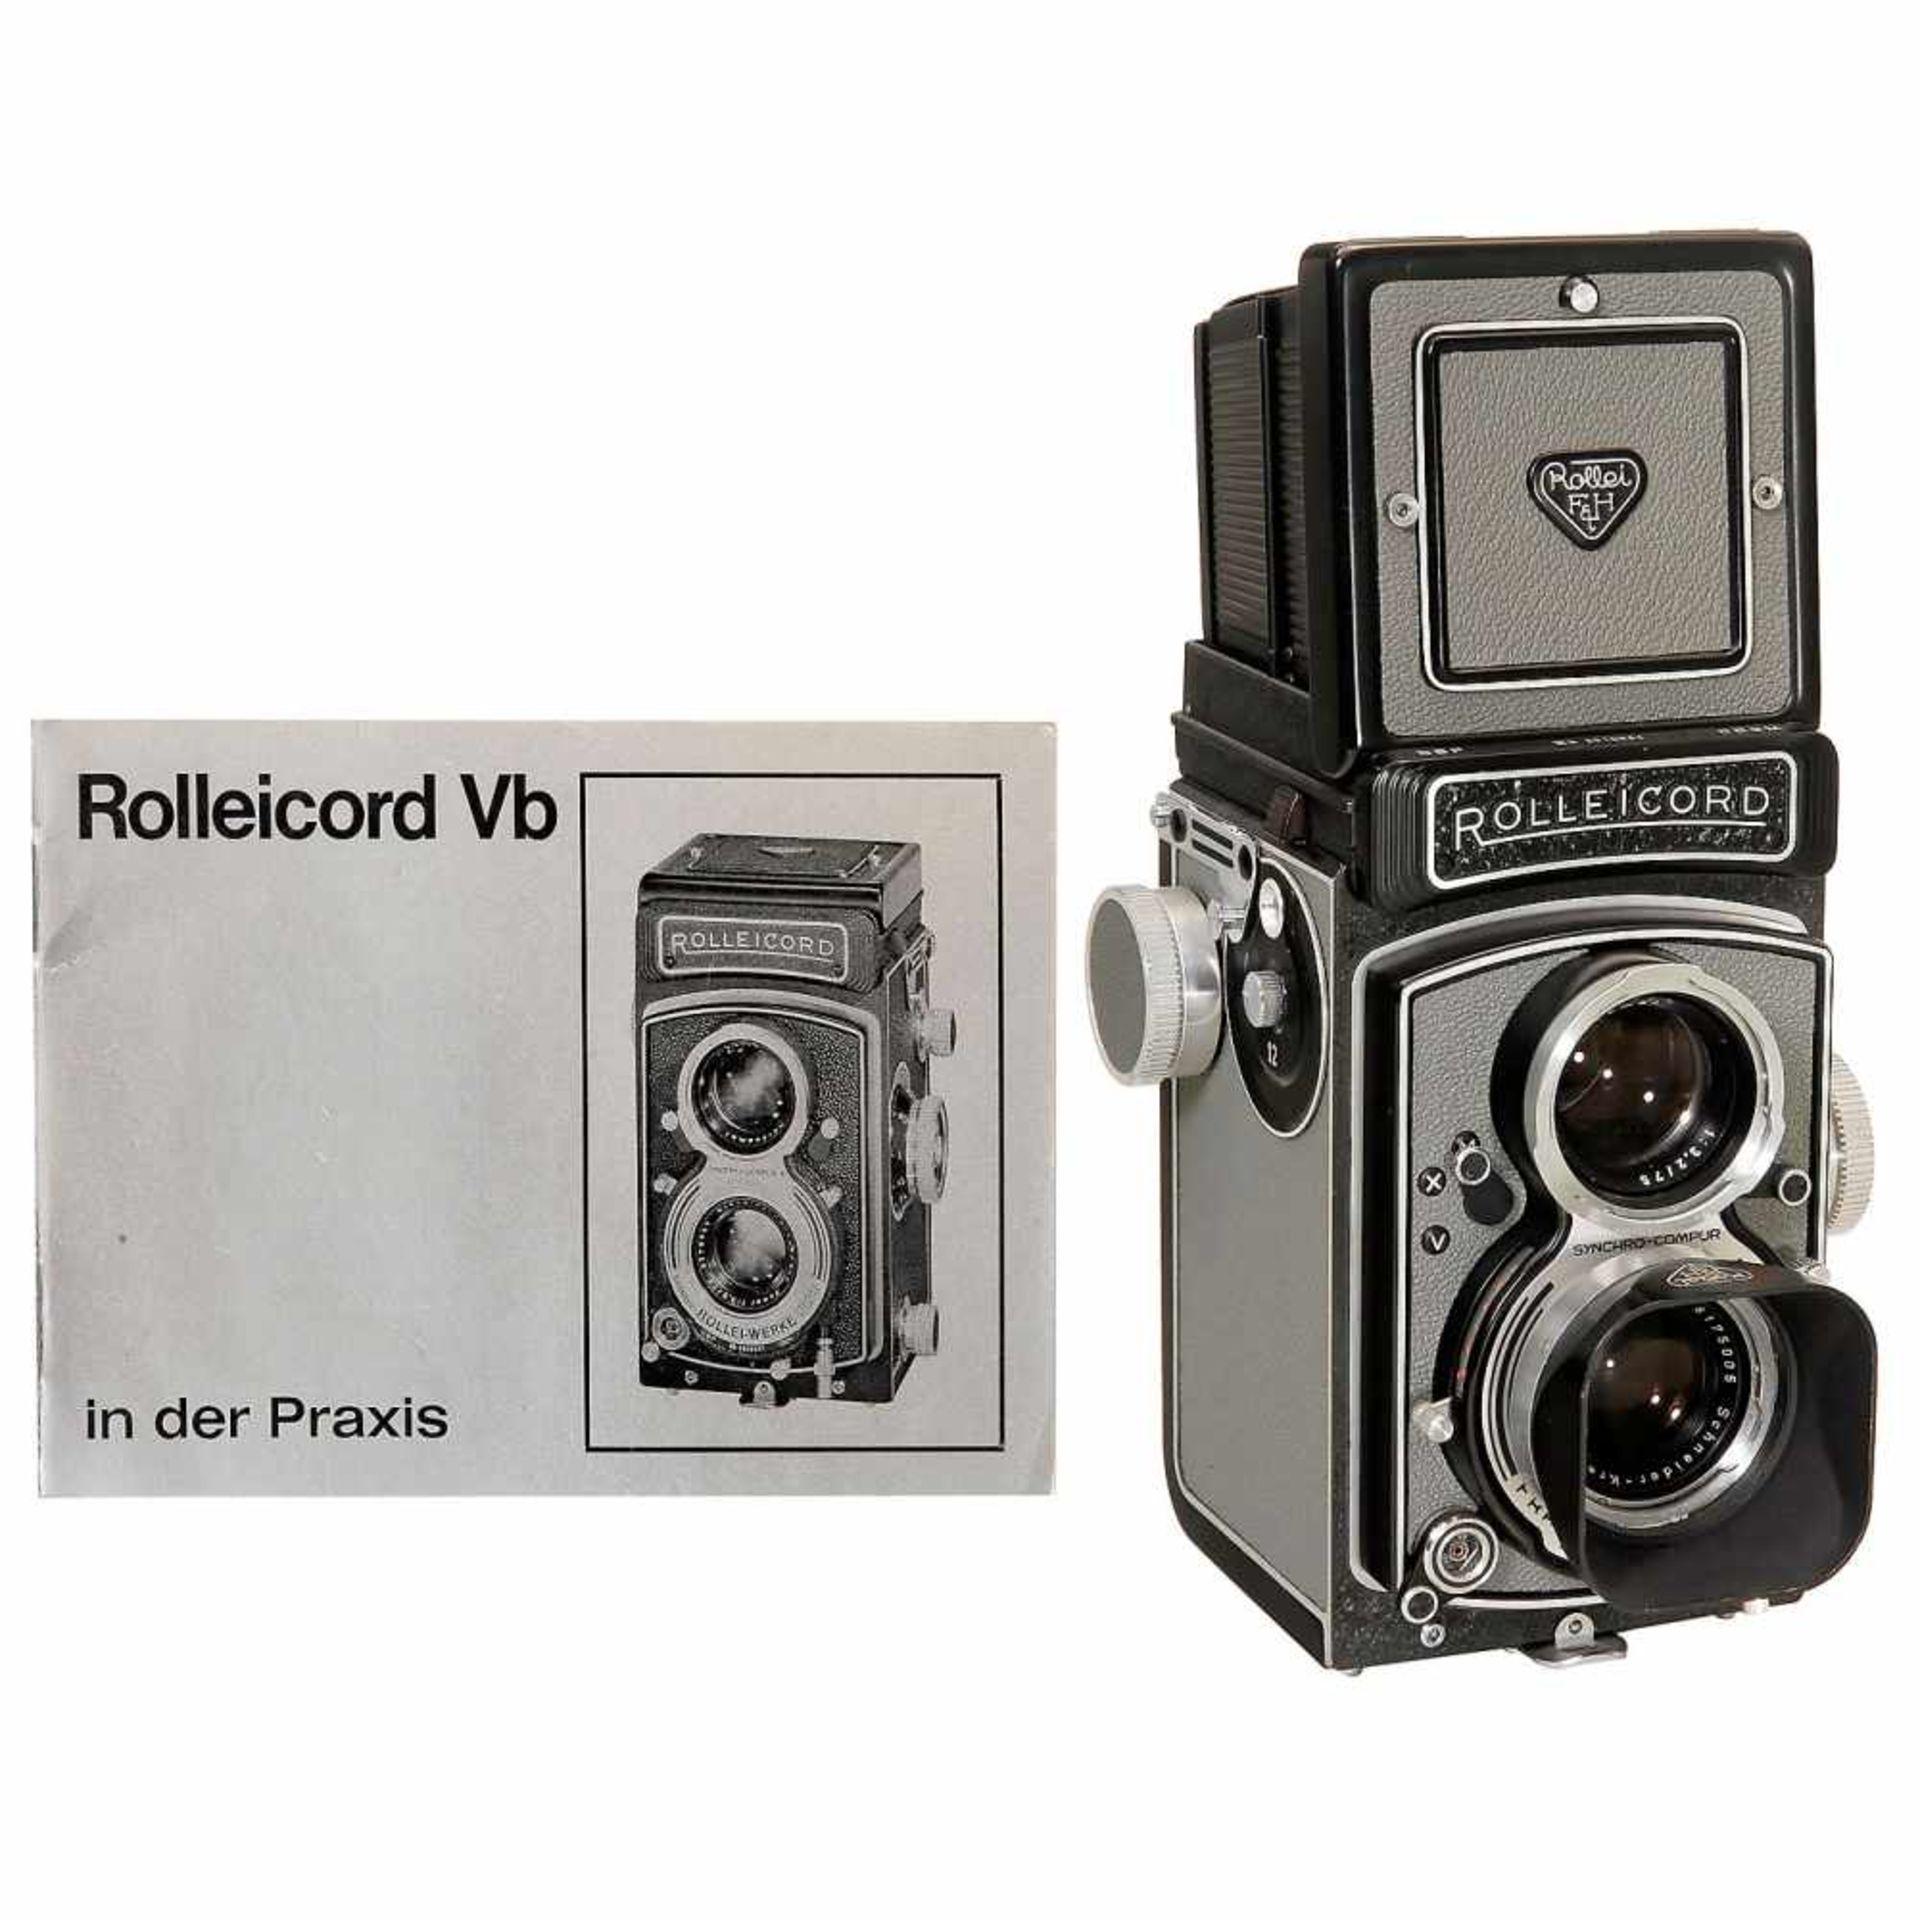 "Near-Mint Rolleicord Vb ""MXV"", 1962Franke & Heidecke, Braunschweig. No. 2610684, Xenar 3,5/75 mm,"